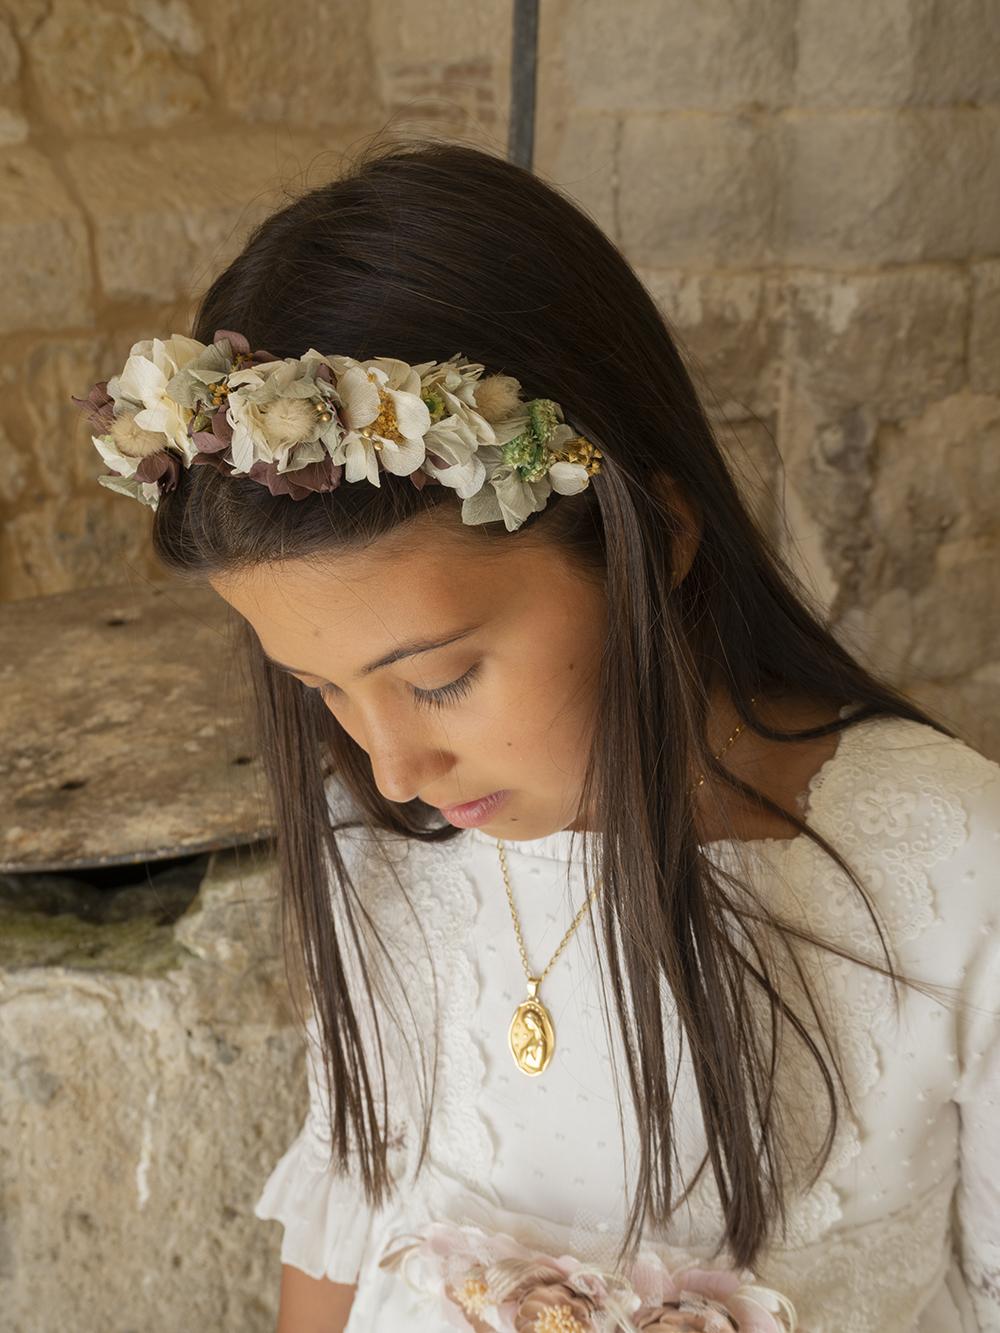 Coronas de flores para decorar + Sorteo_23